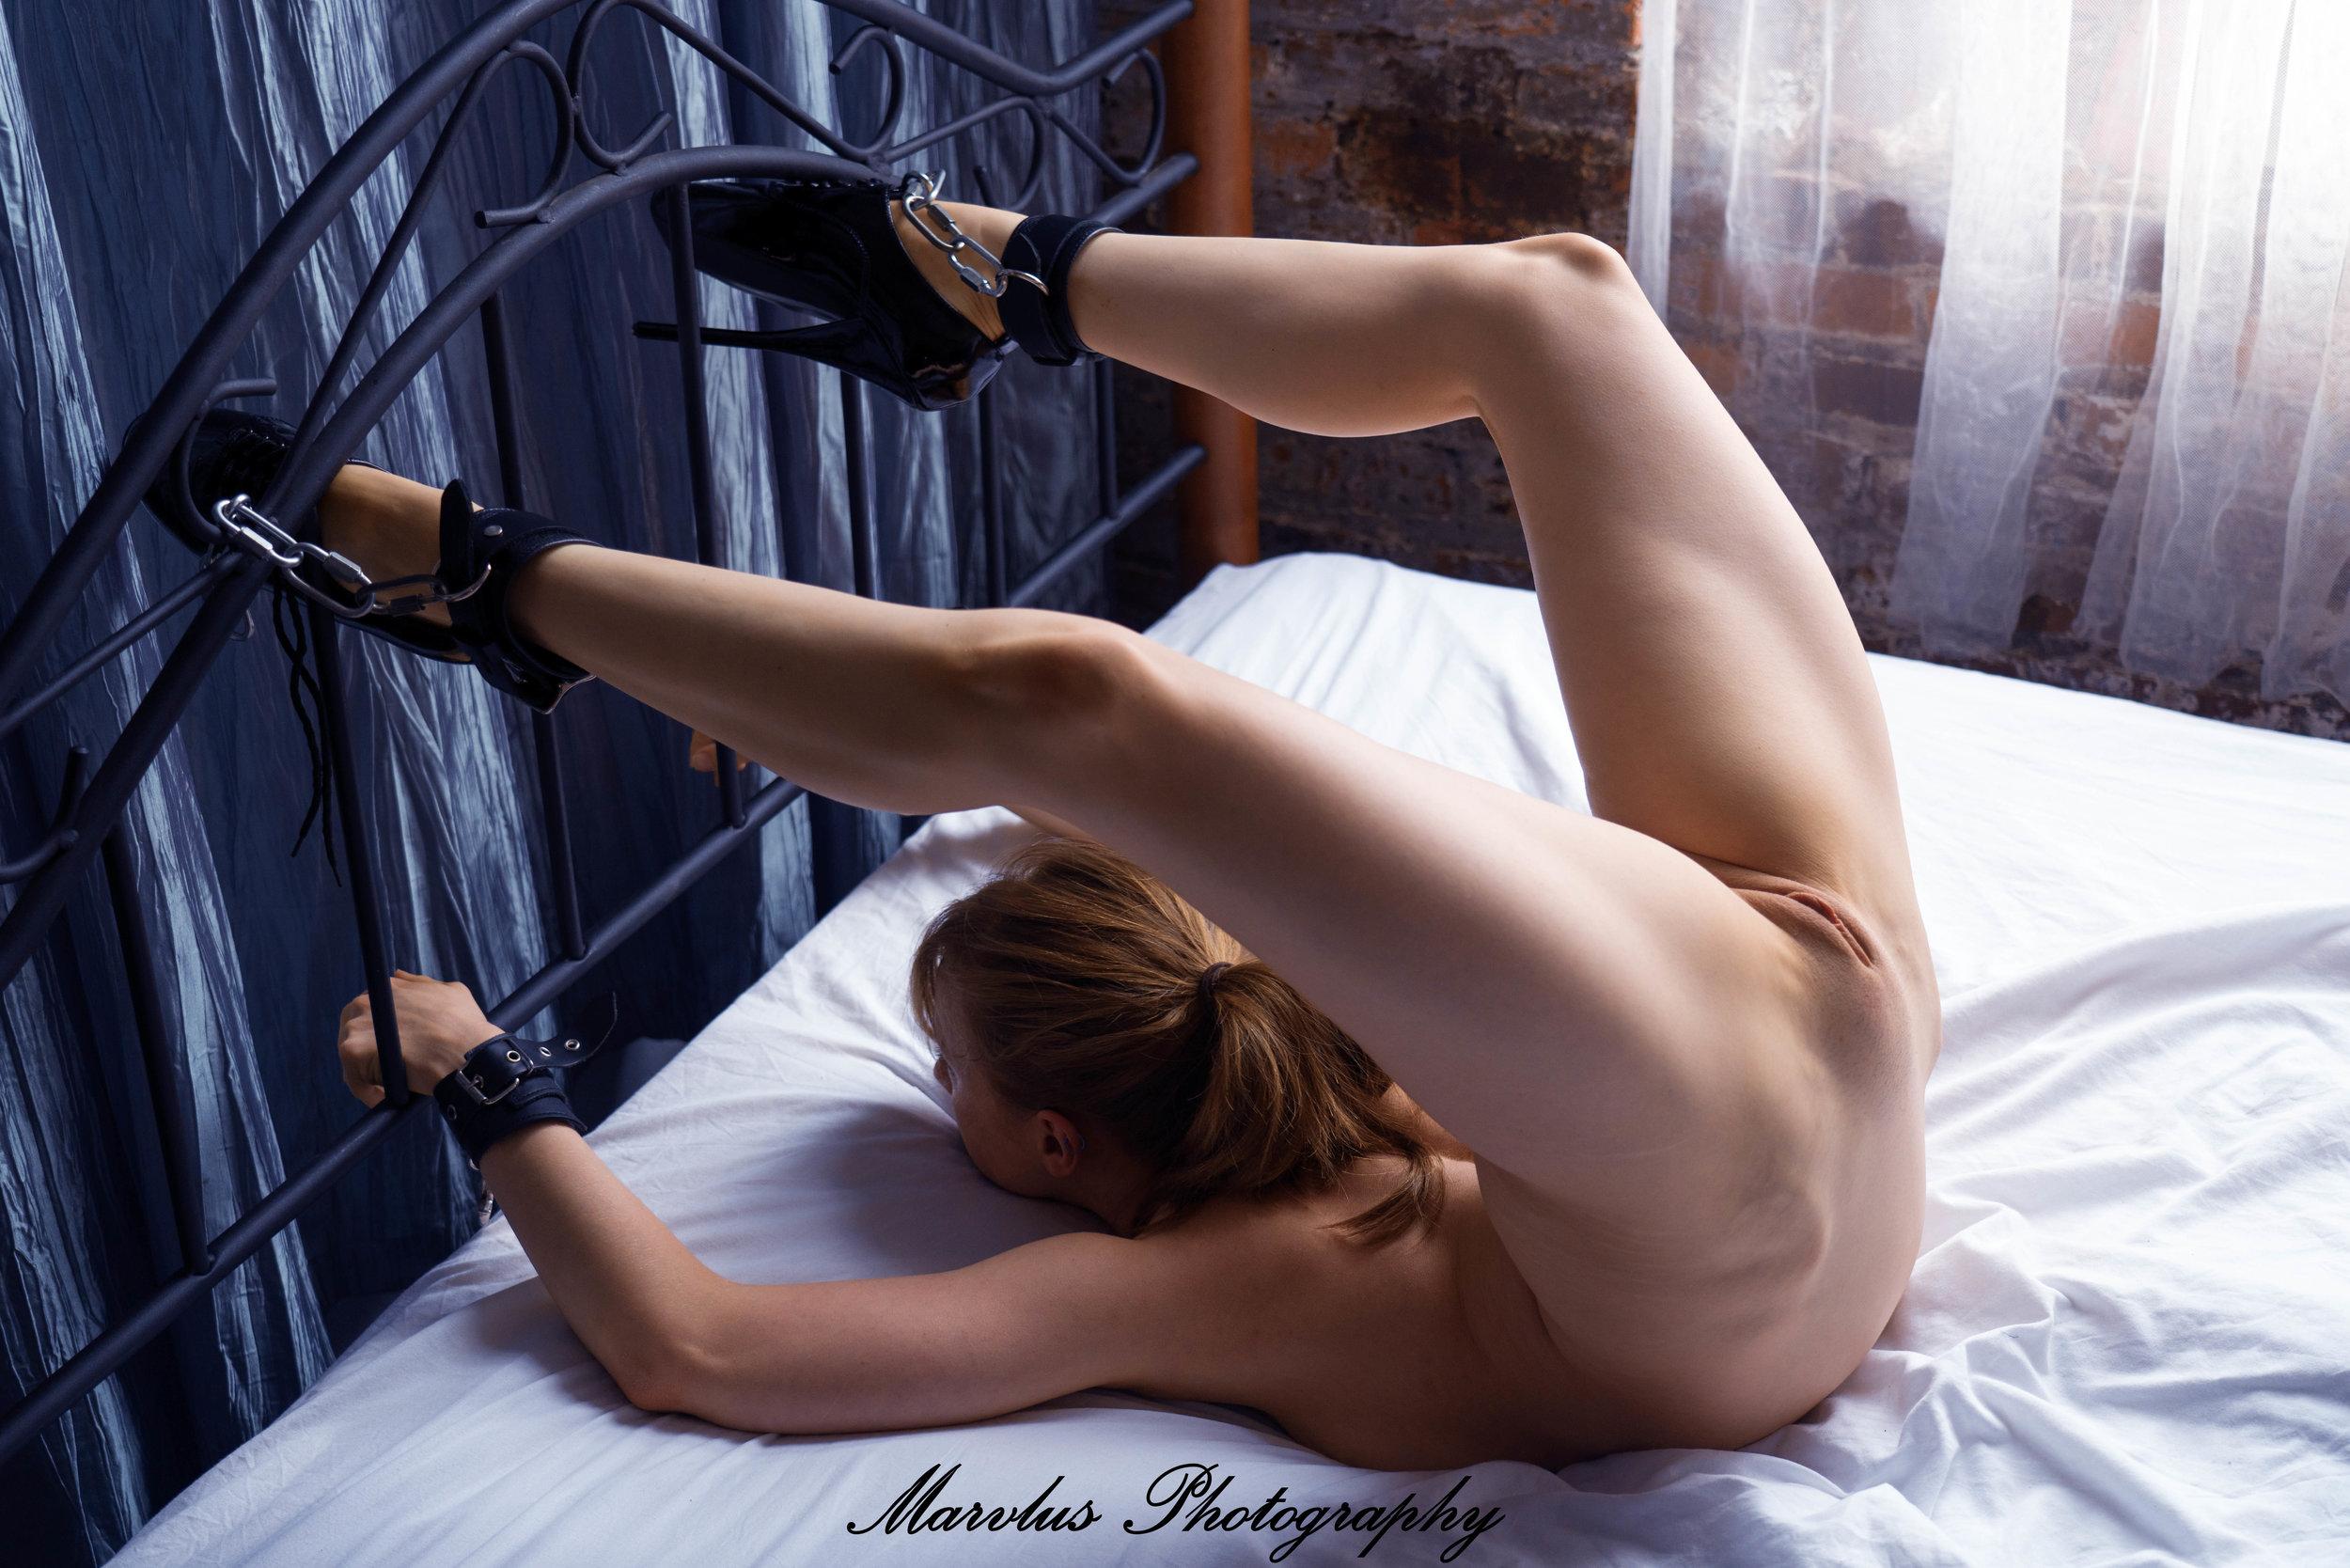 Marvlus Photography